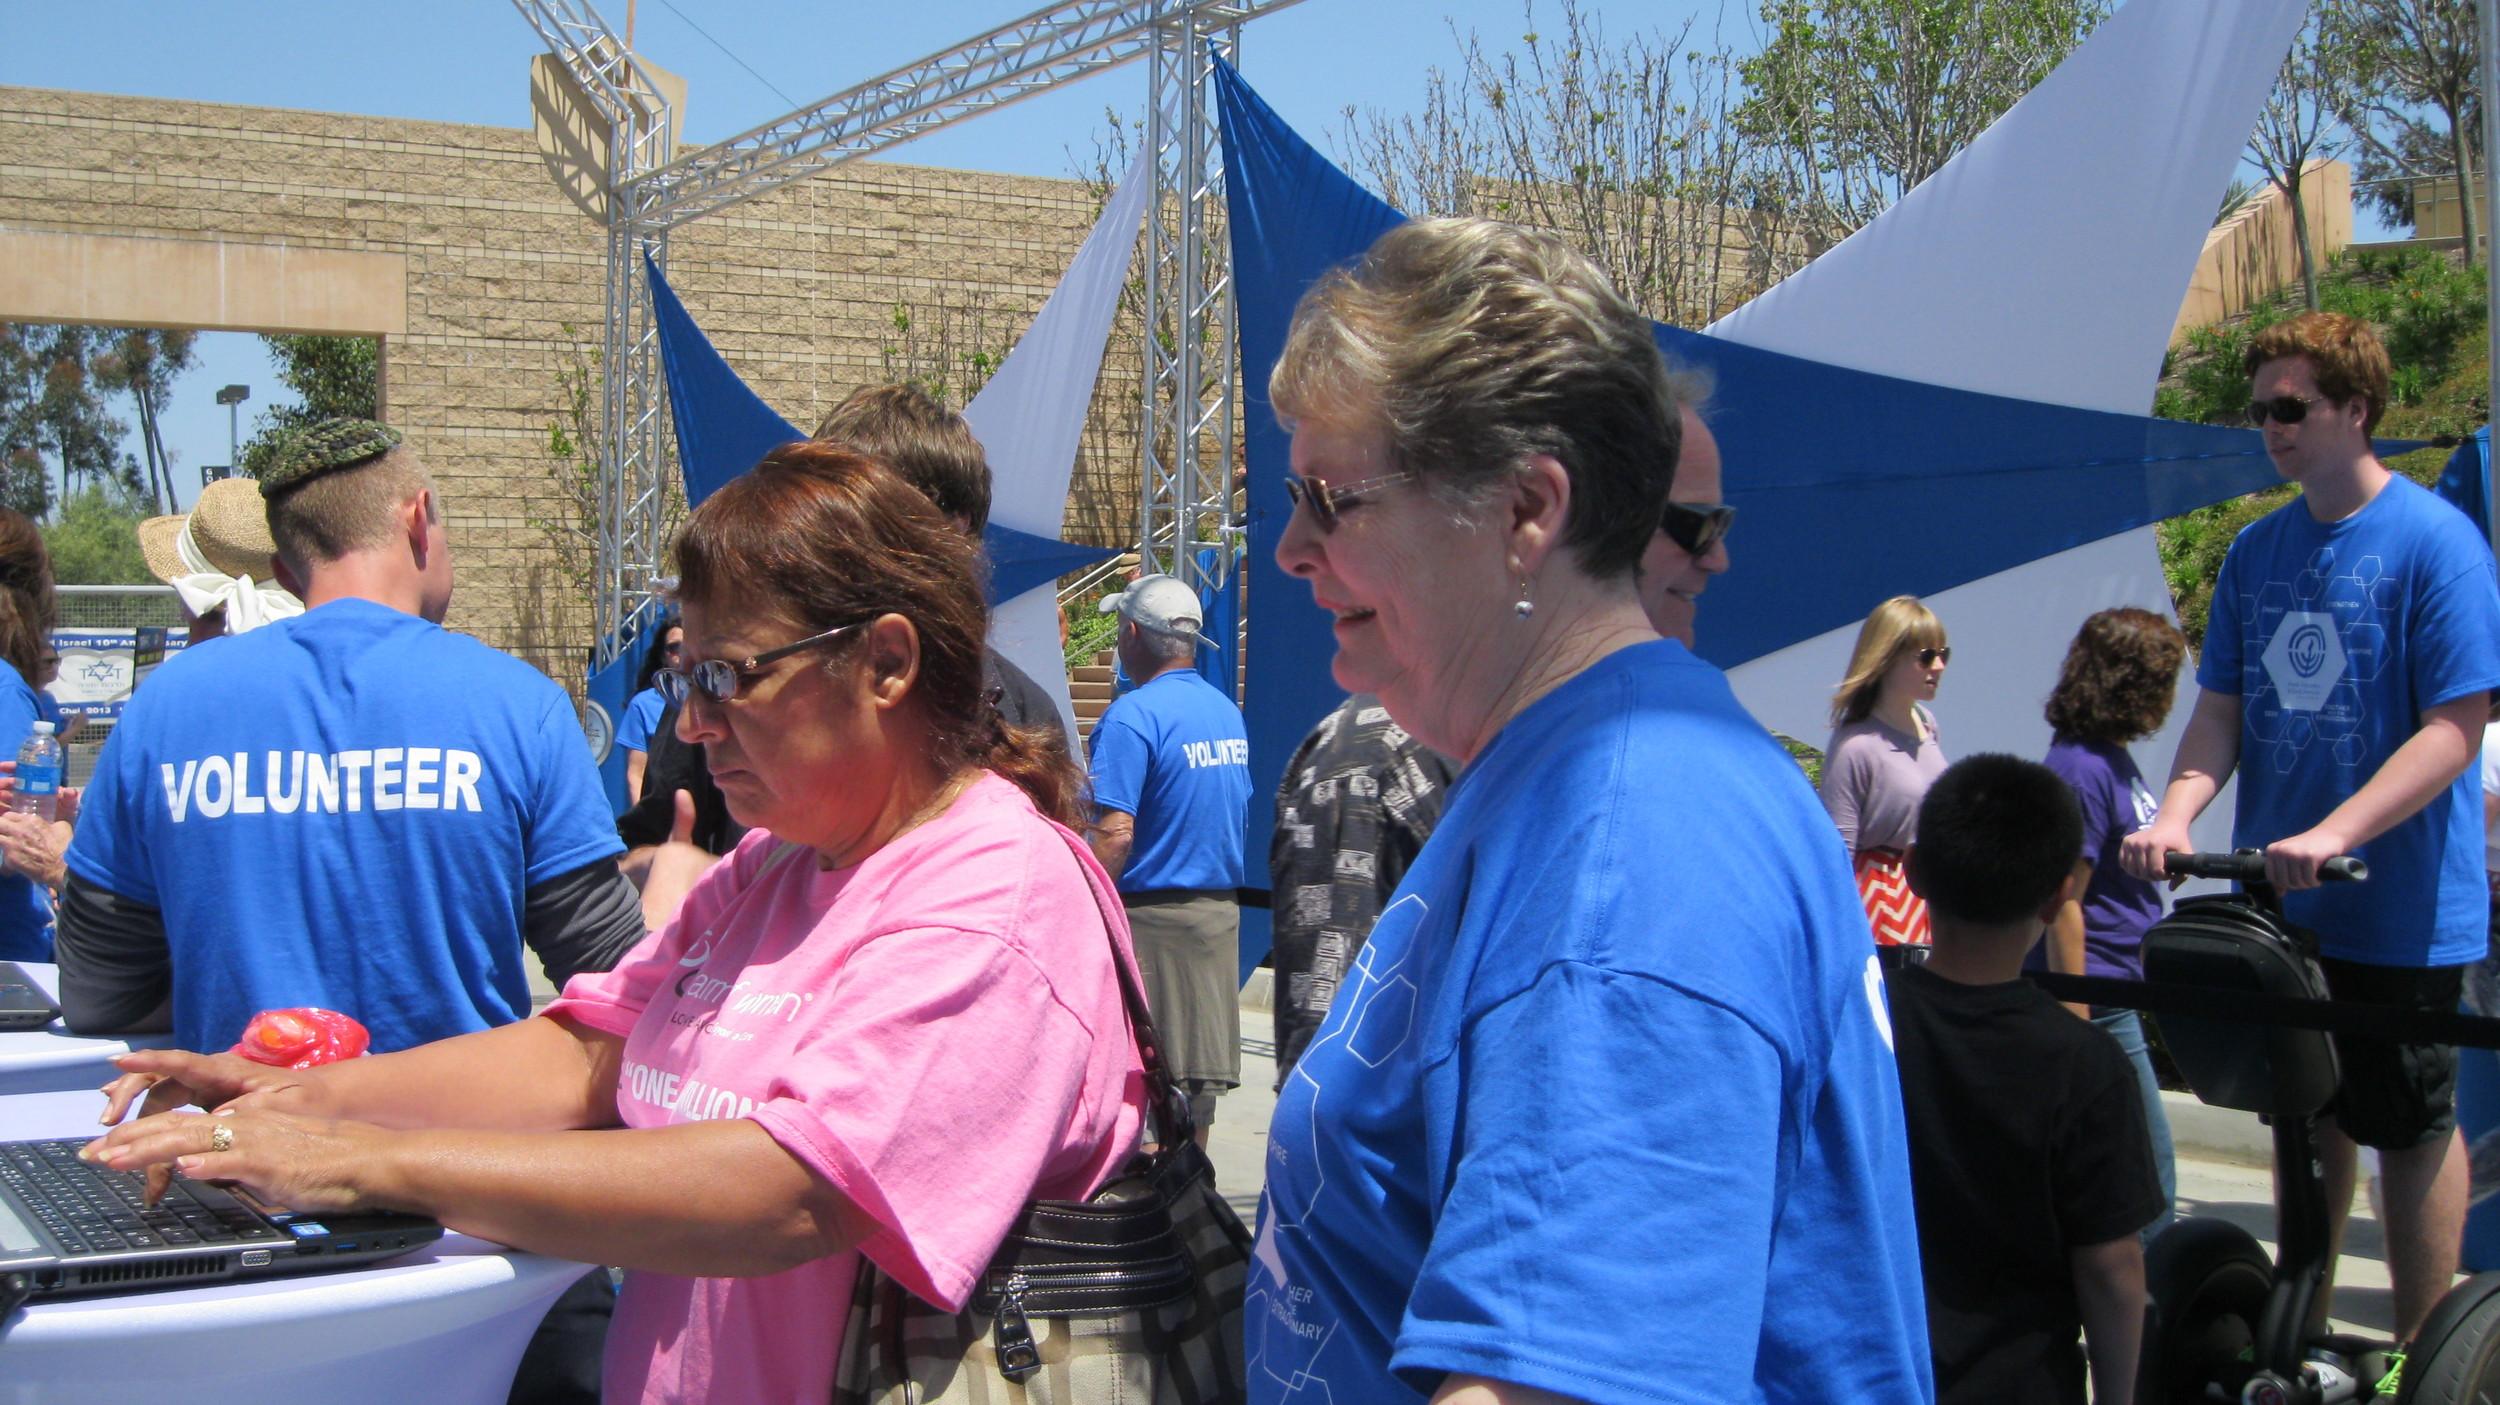 Linda assisting with Registration